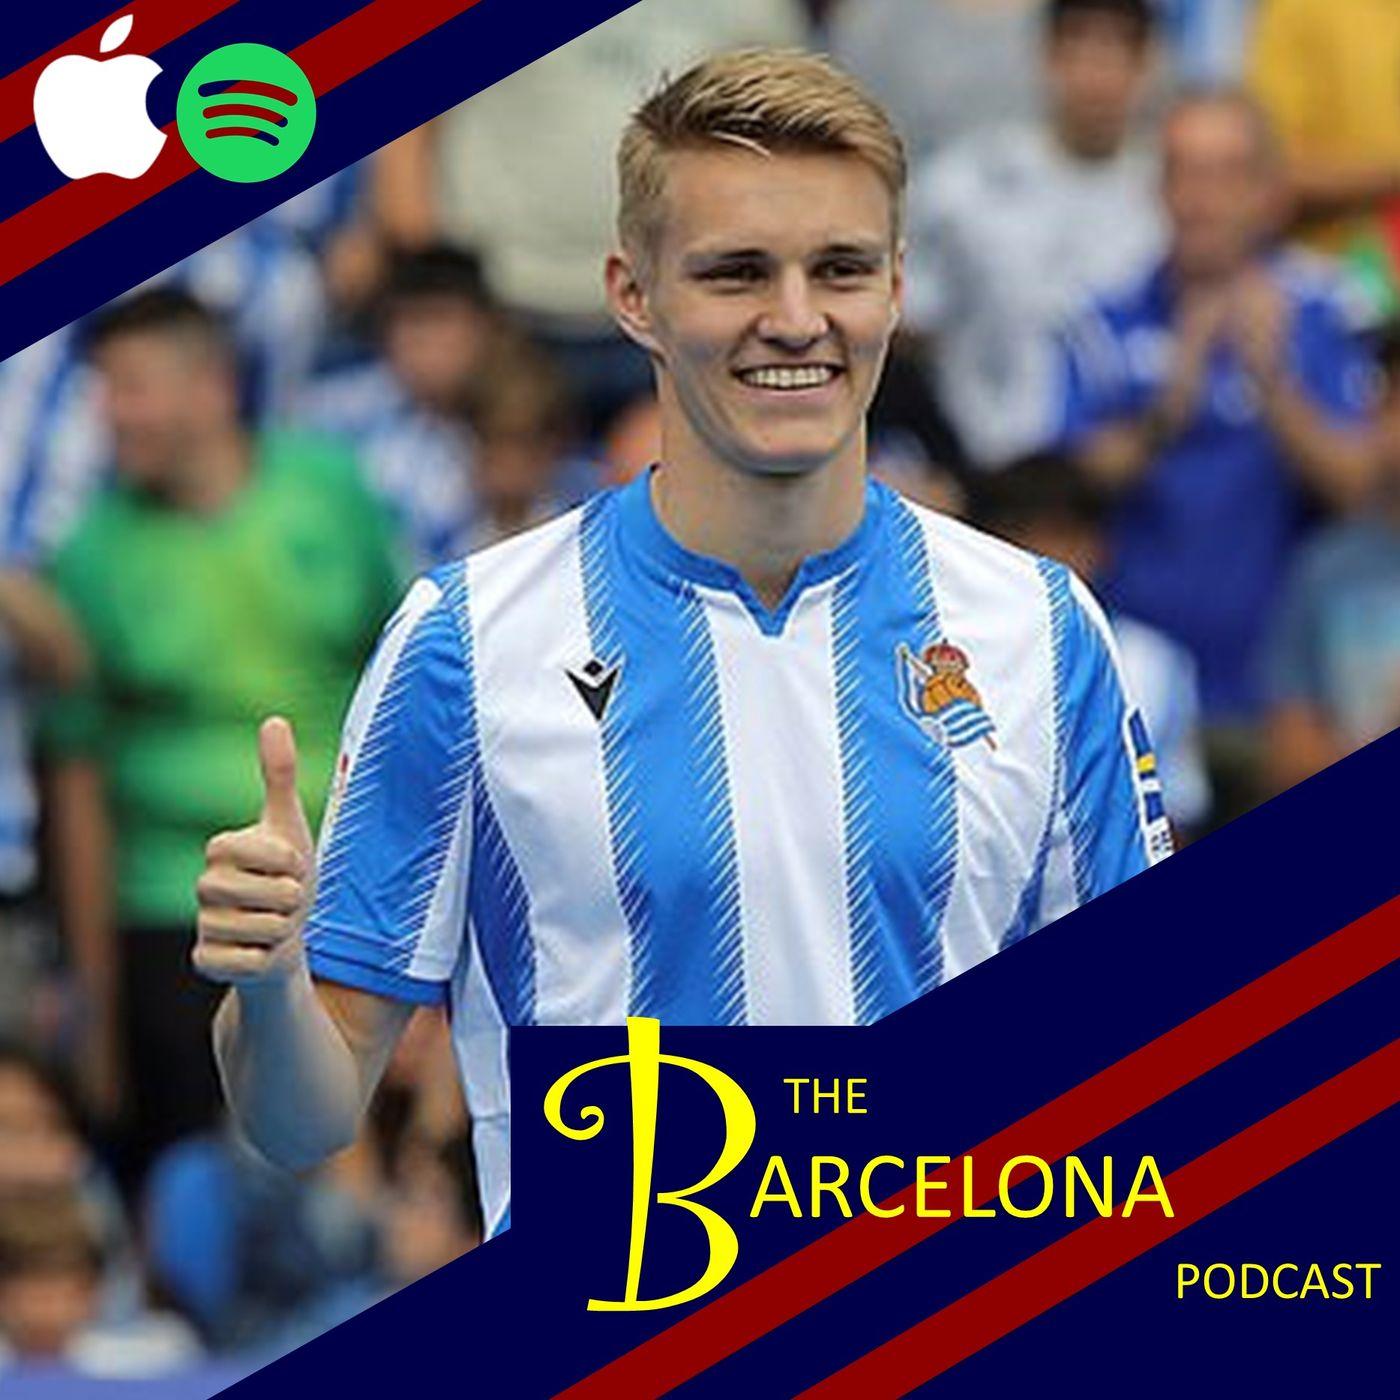 Which La Liga team is winning the transfer window? La Liga Preview with Robbie Dunne [TBPod149]